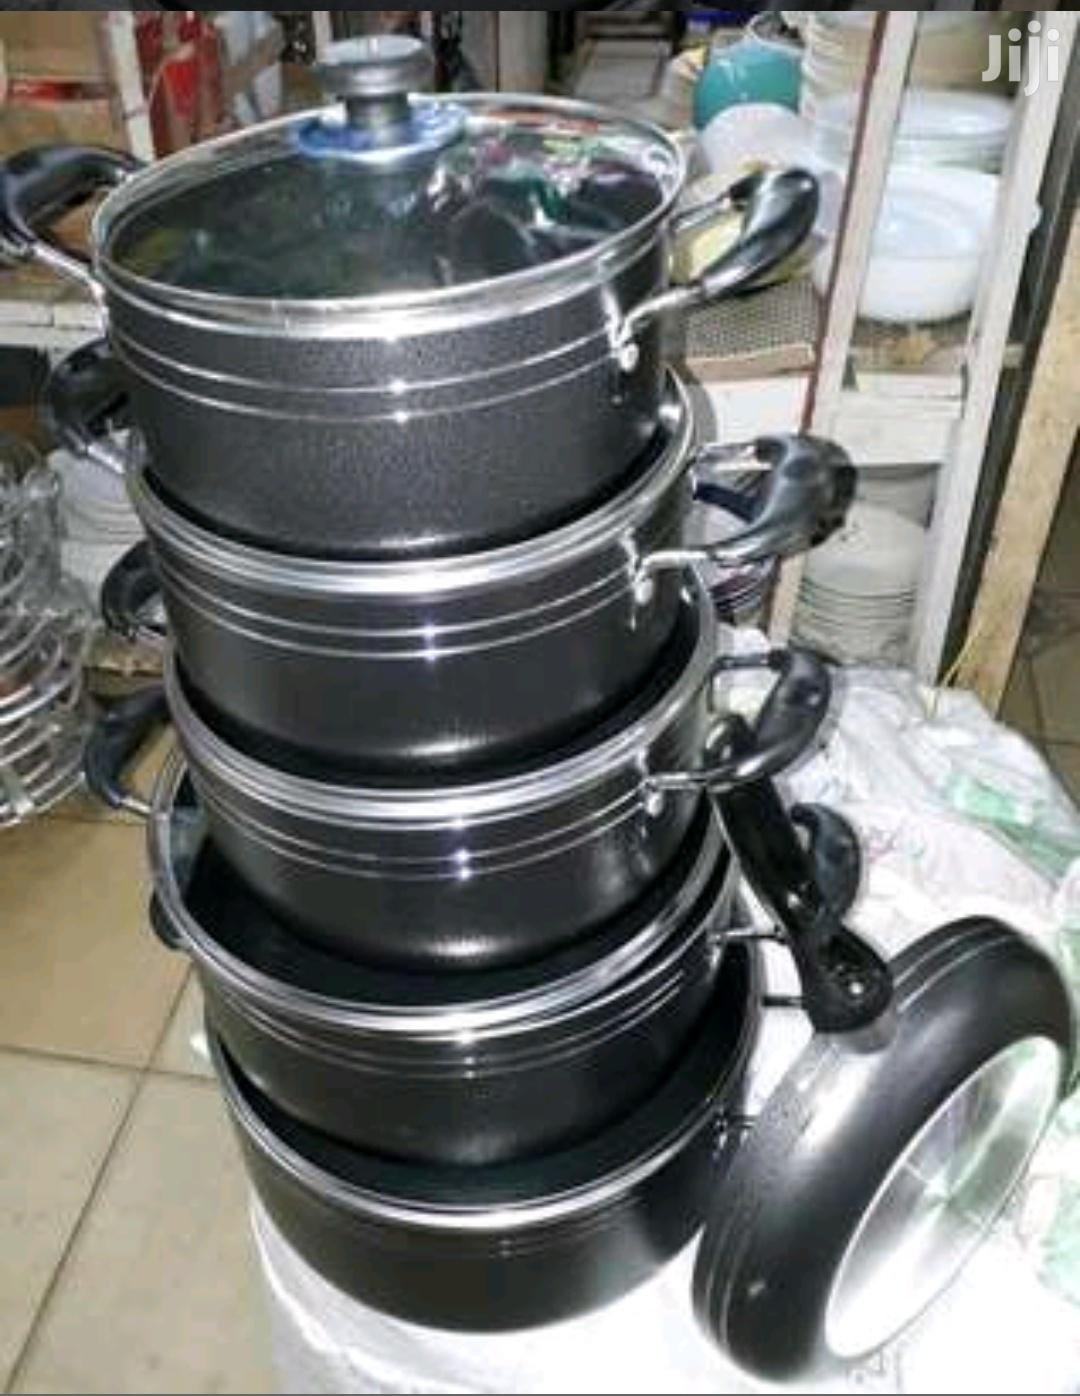 11 Pieces Nonstick Cooking Pan | Kitchen & Dining for sale in Nairobi Central, Nairobi, Kenya